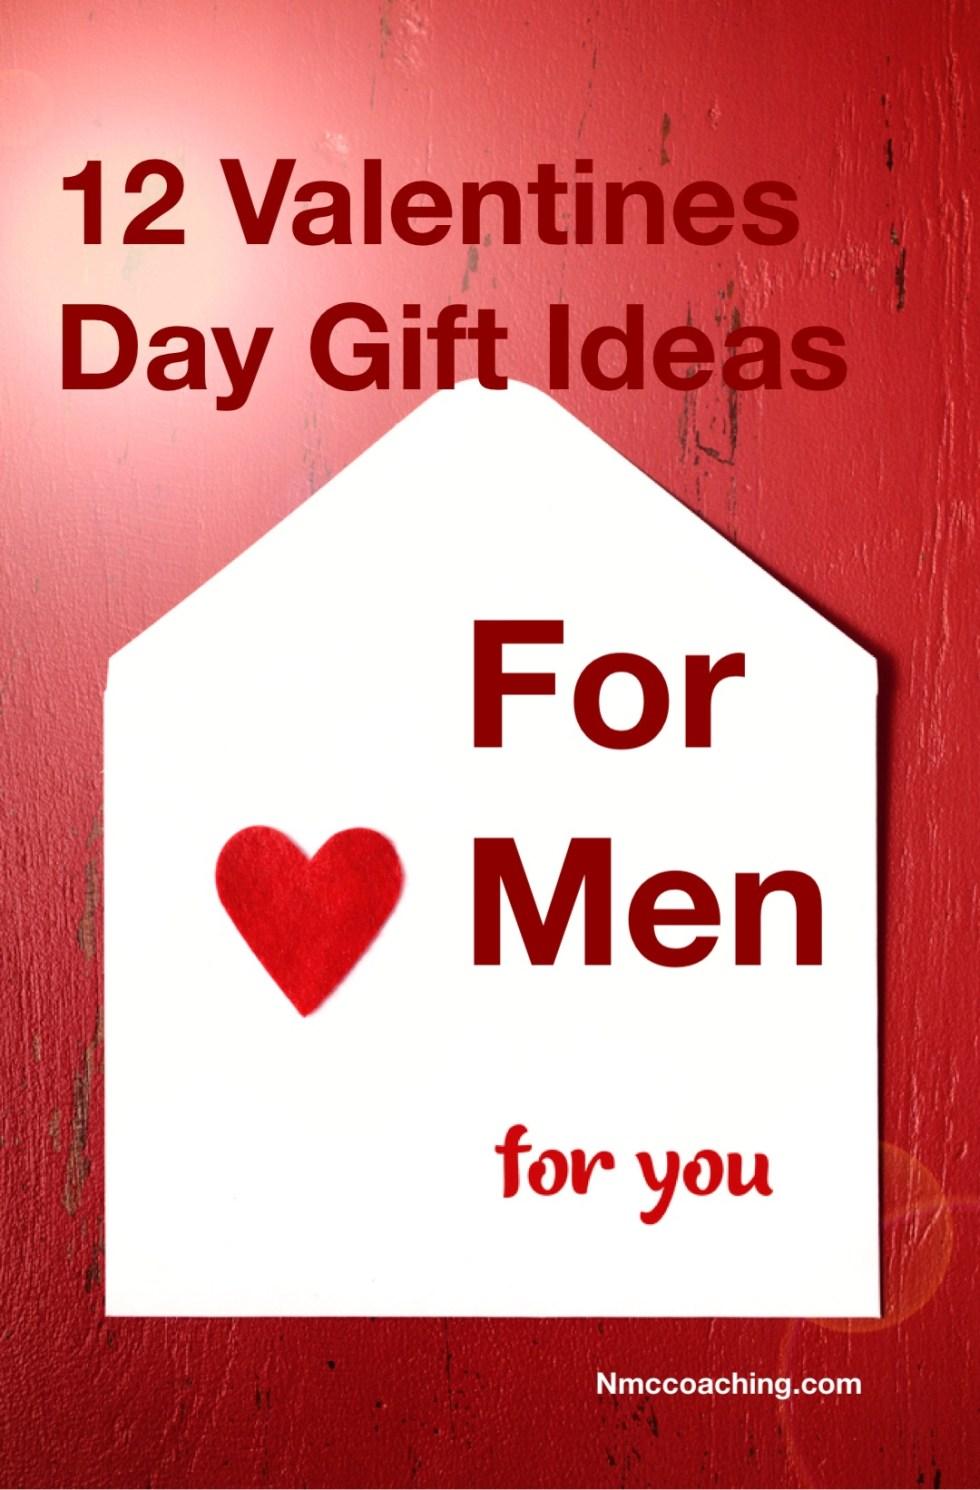 12 Valentine's Day gift ideas for men